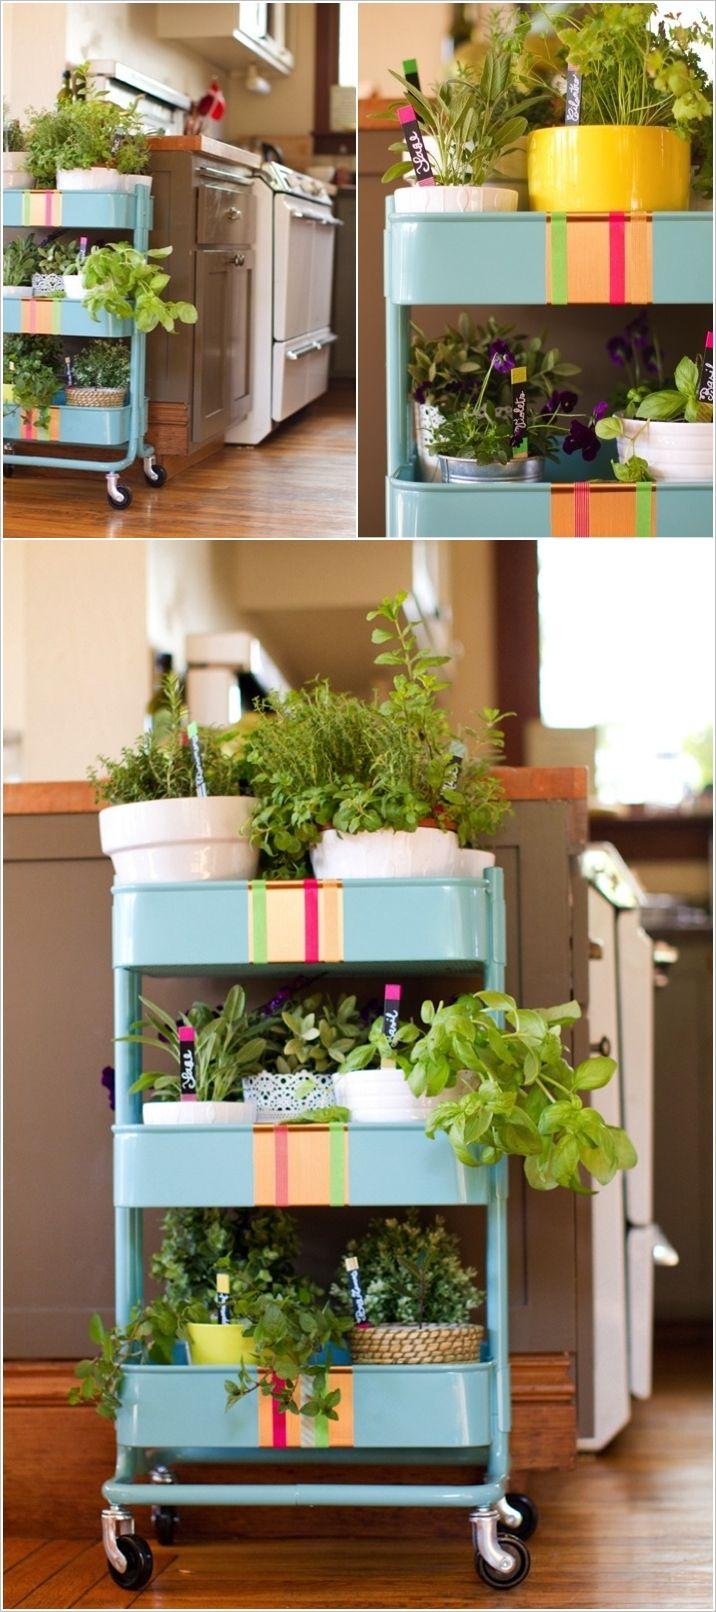 RÅSKOG Kitchen Cart Into A Rolling Herb Garden   IKEA Hackers